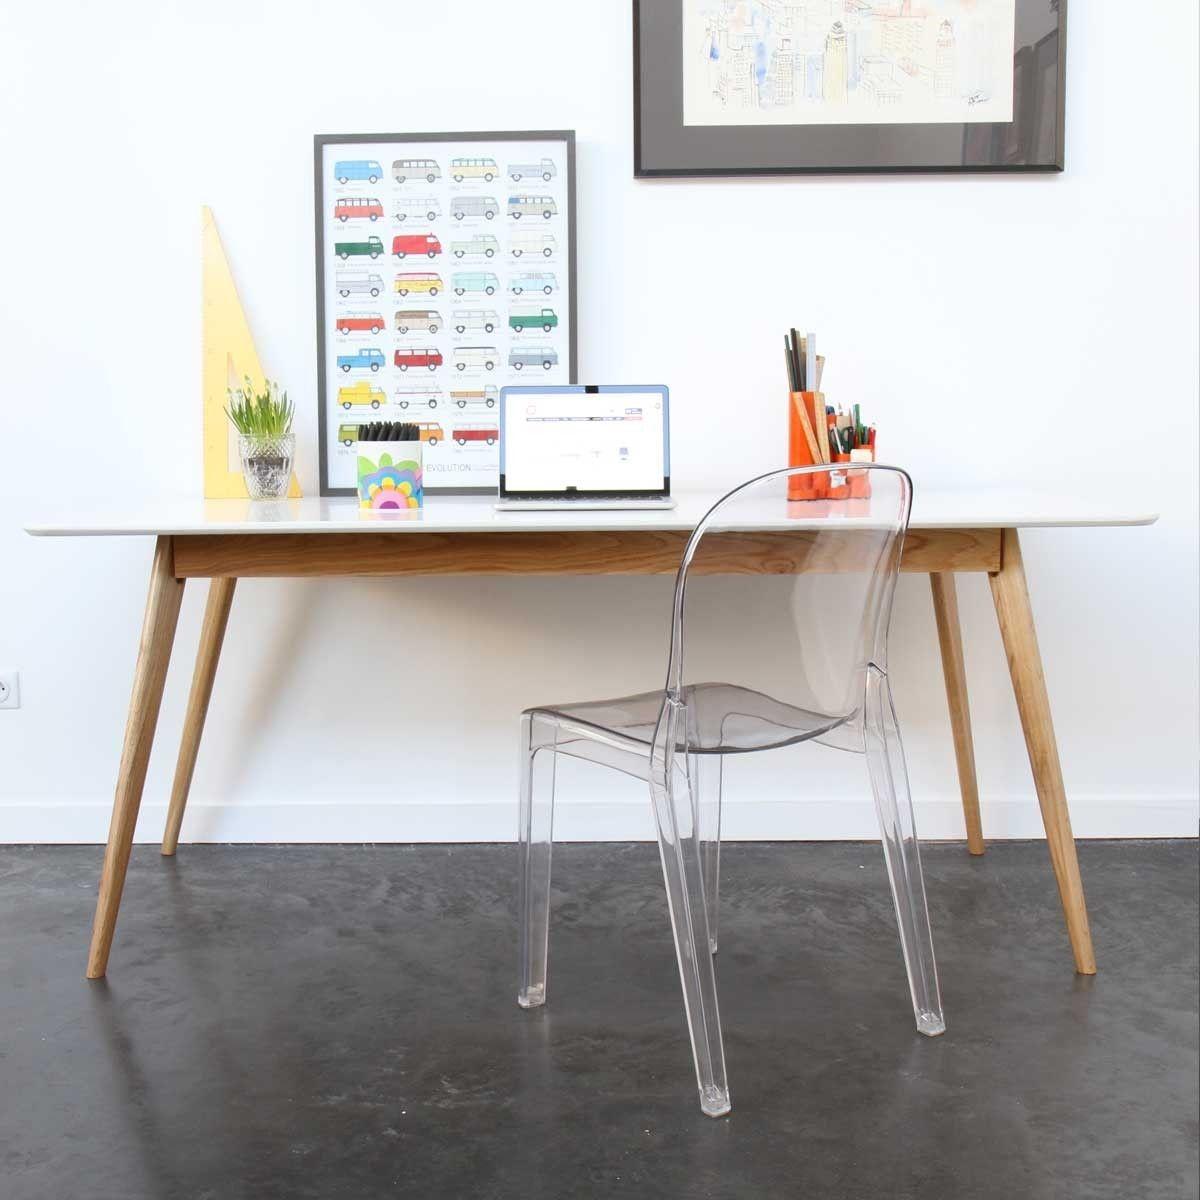 Drawer bois à en 160x80cm Table SKOLLMeubles manger Y6bfy7g